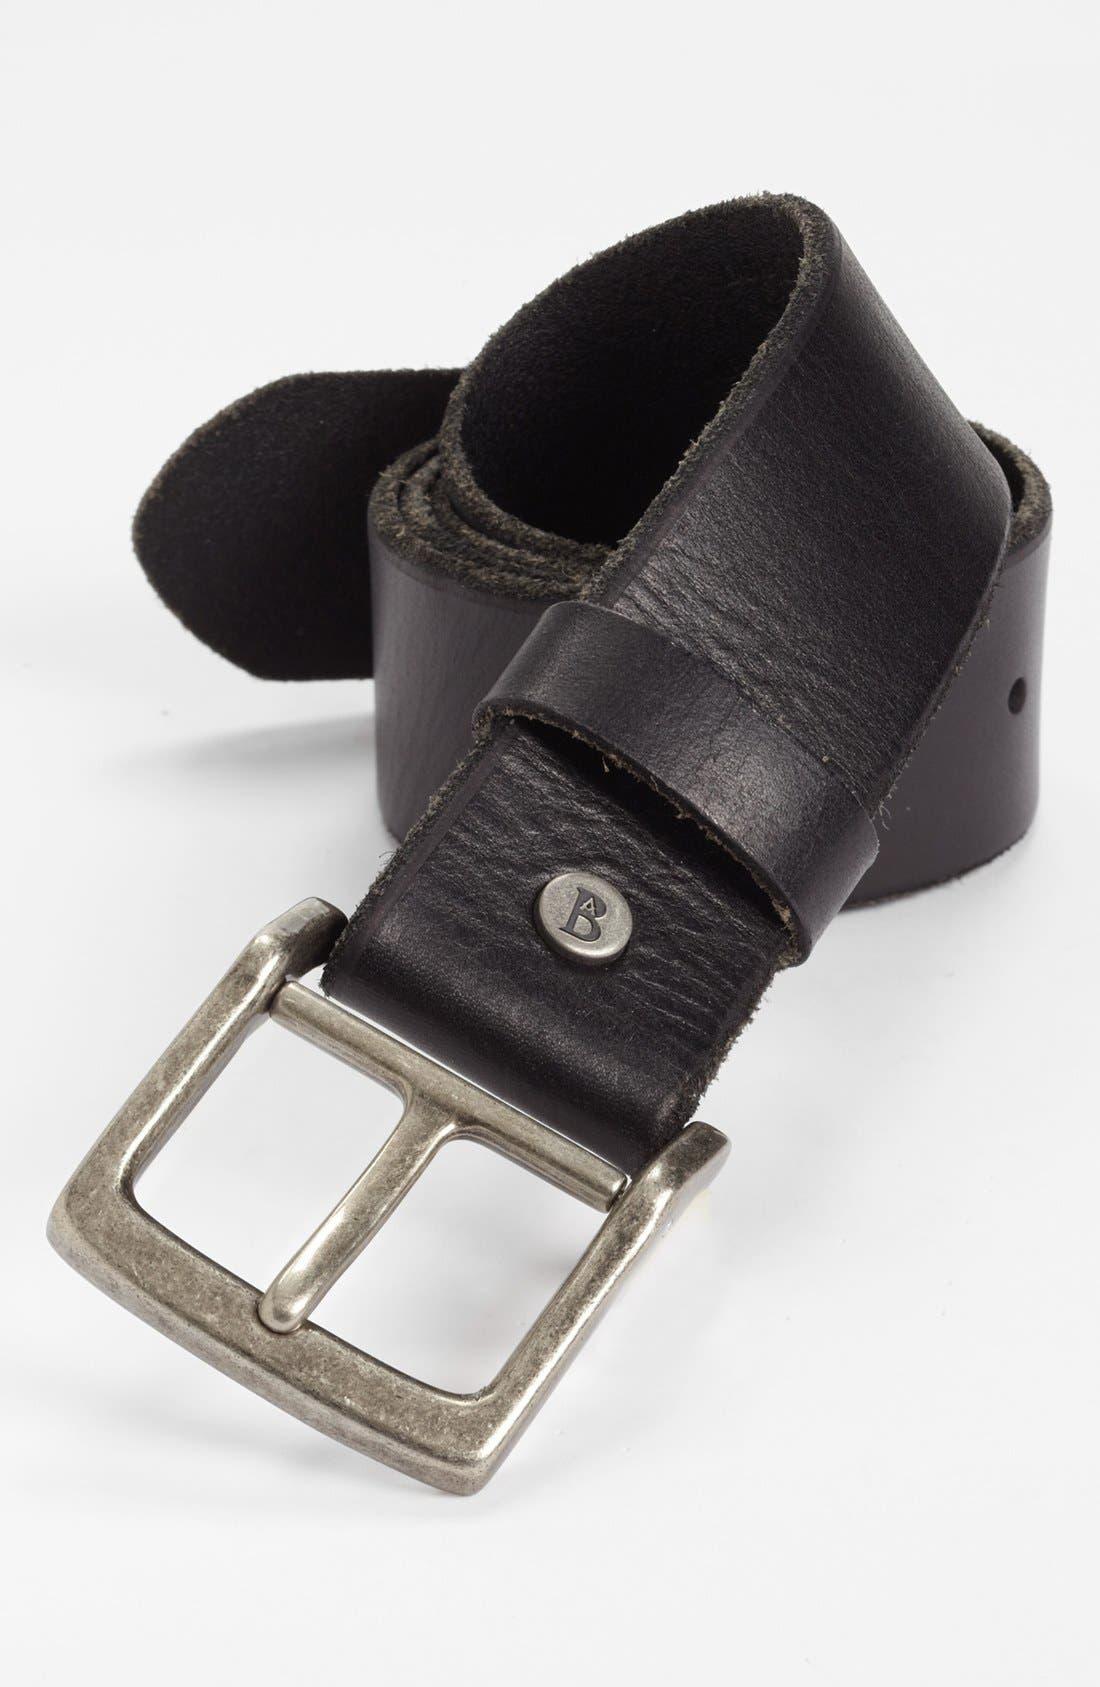 Main Image - Bill Adler 1981 'Retro Jean' Leather Belt